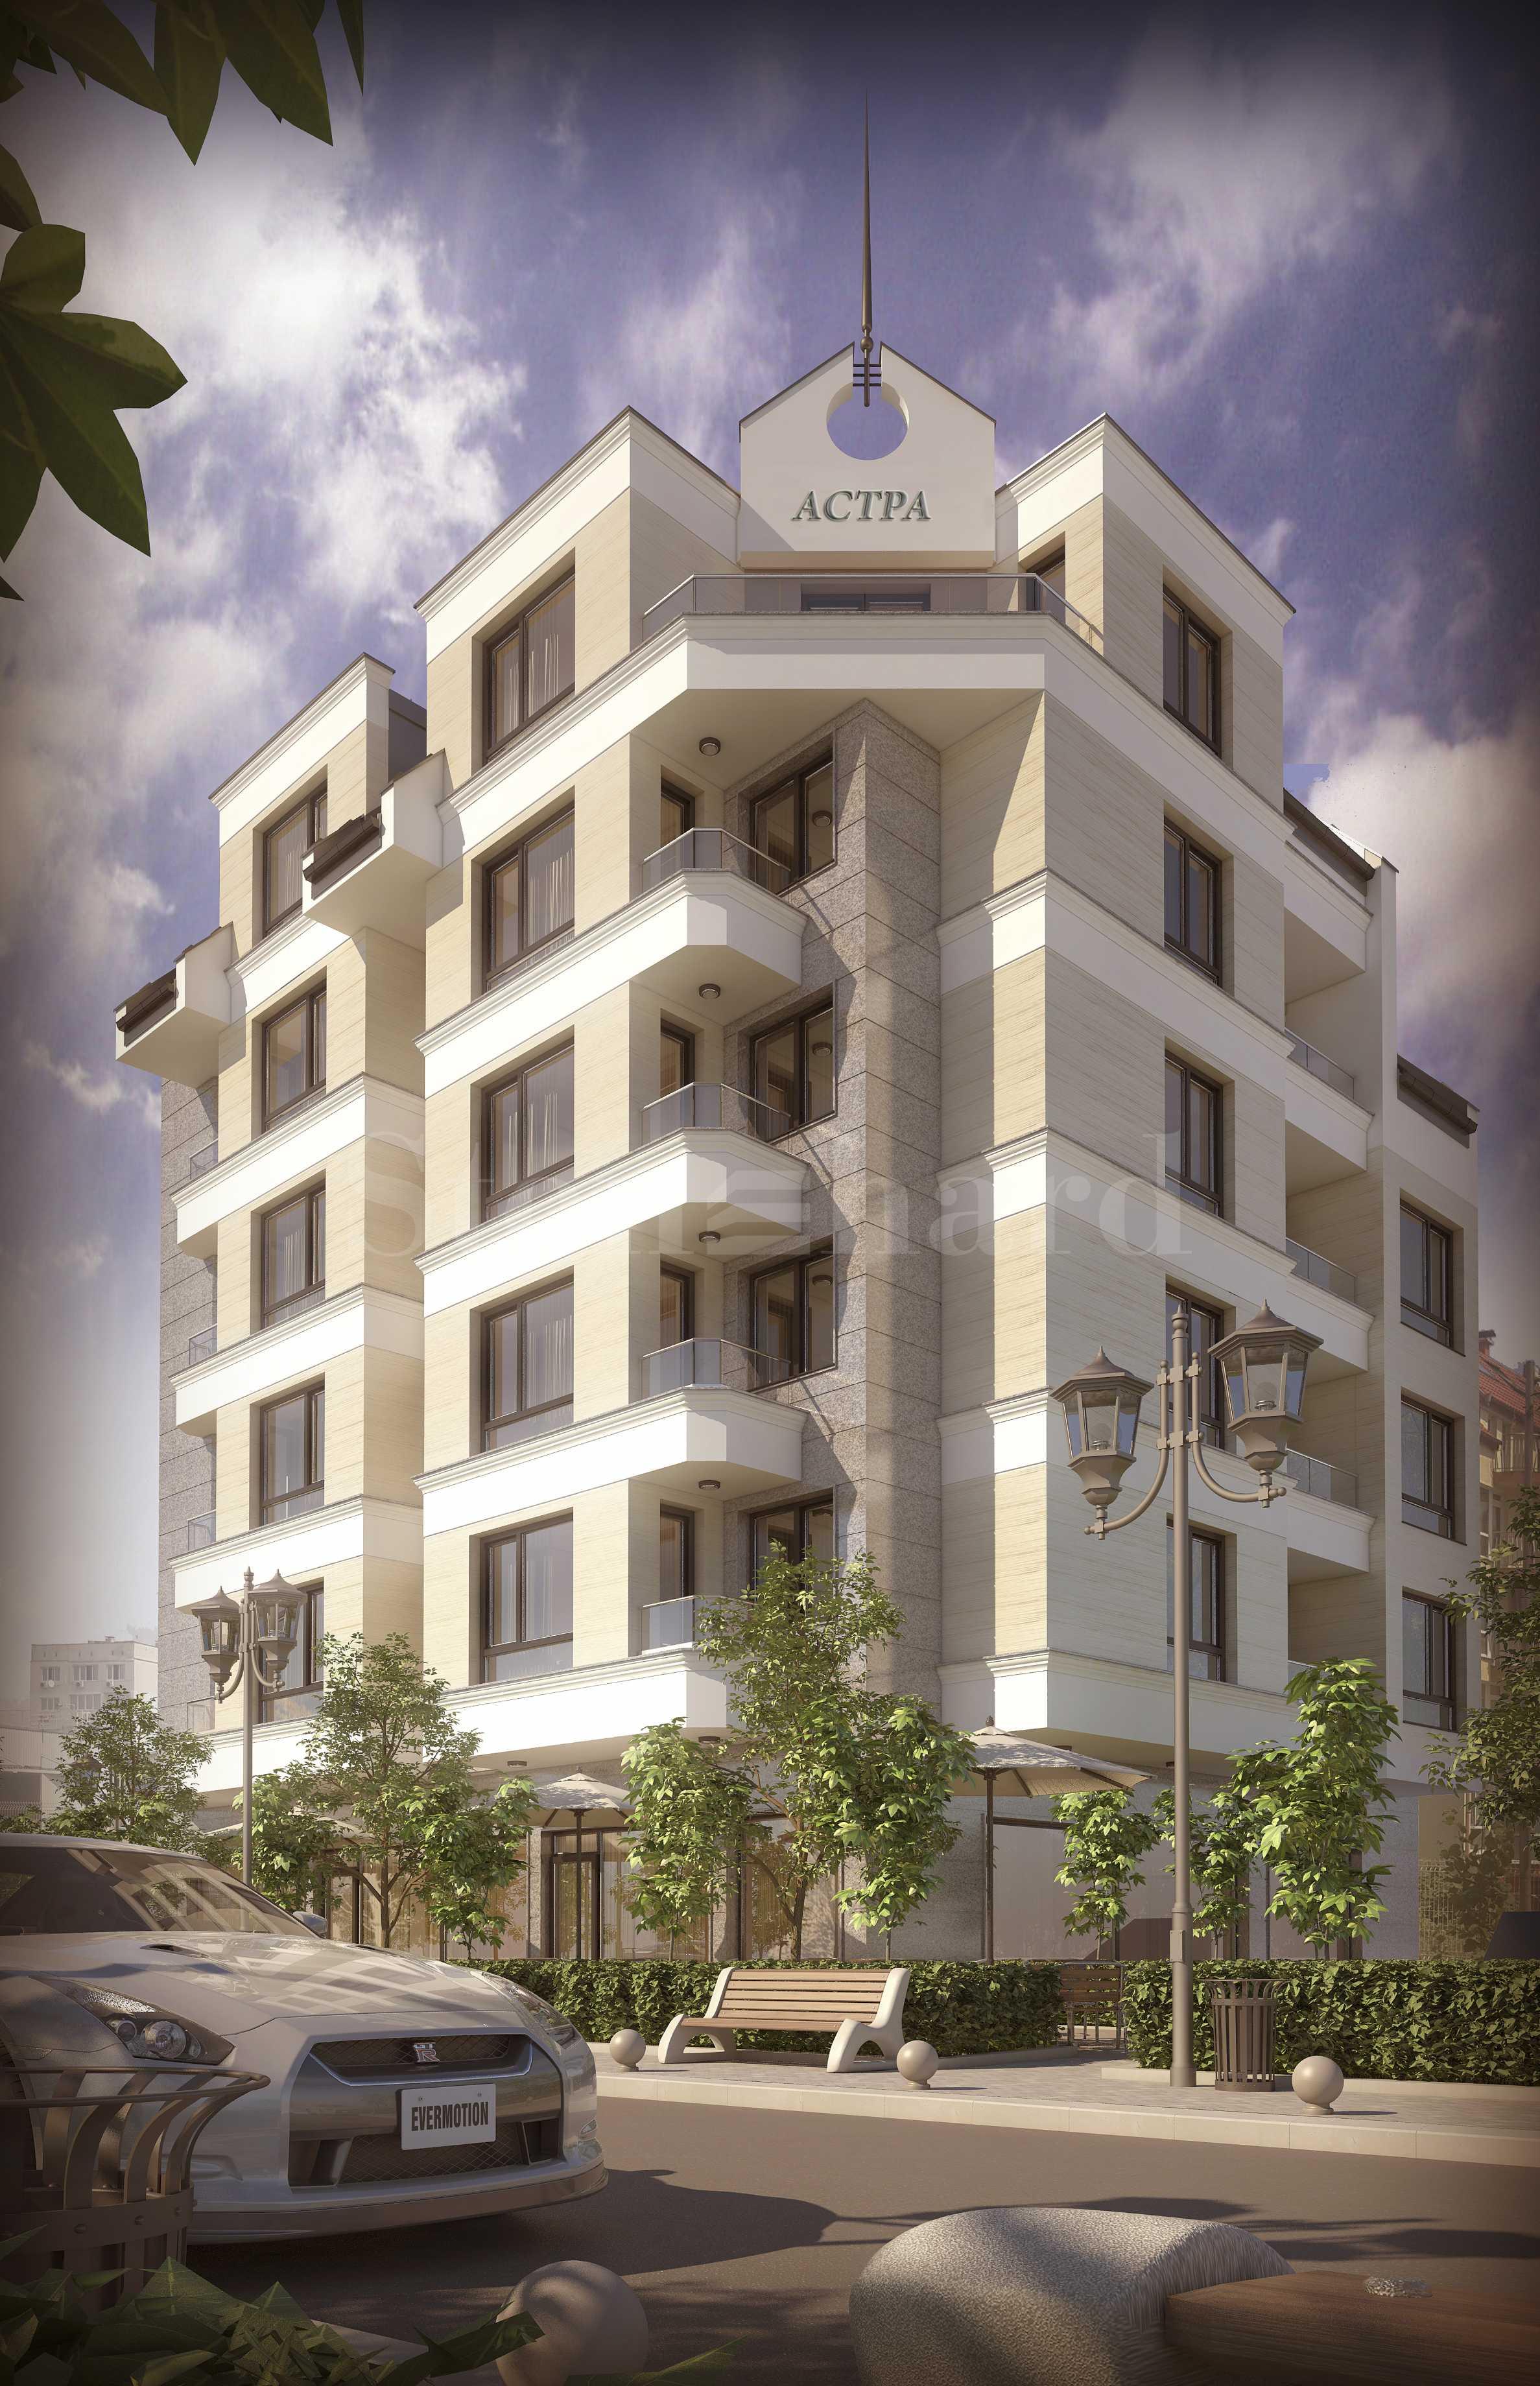 2-bedroom apartment in Sofia2 - Stonehard